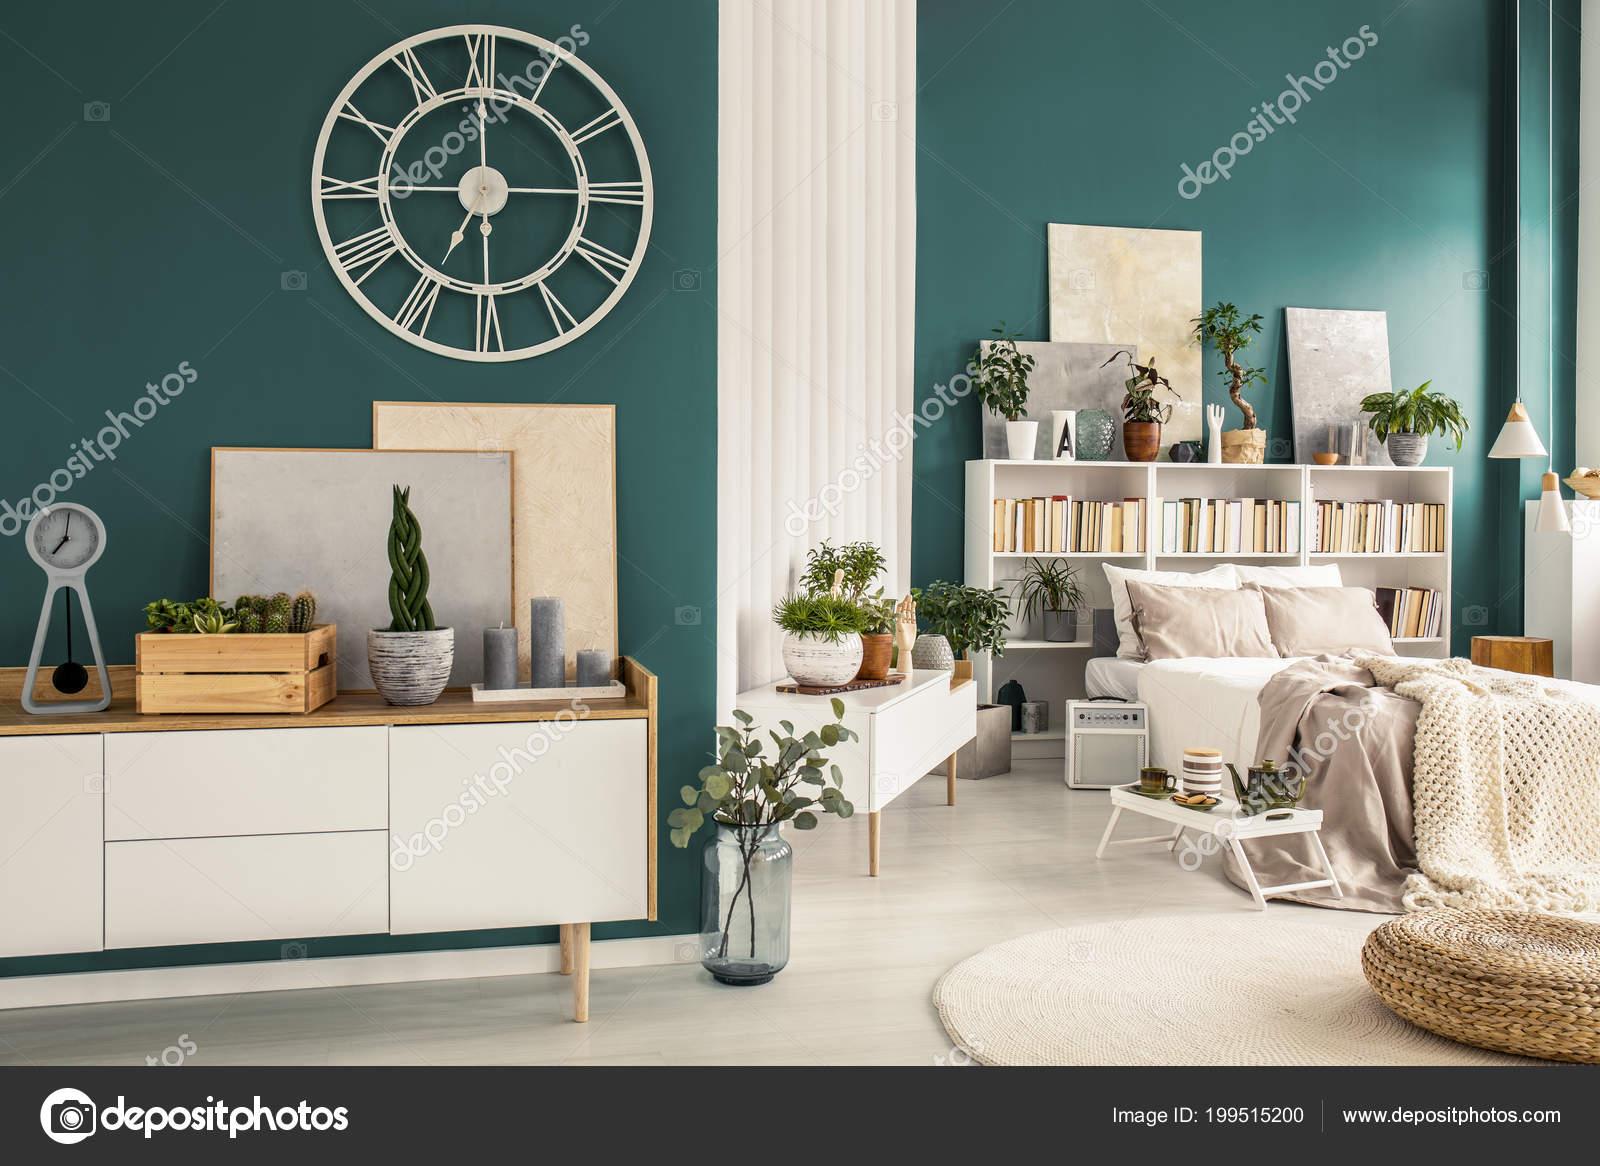 Modern Studio Apartment Interior Cozy Bedroom White Wooden Furniture Designer Stock Photo Image By C Photographee Eu 199515200